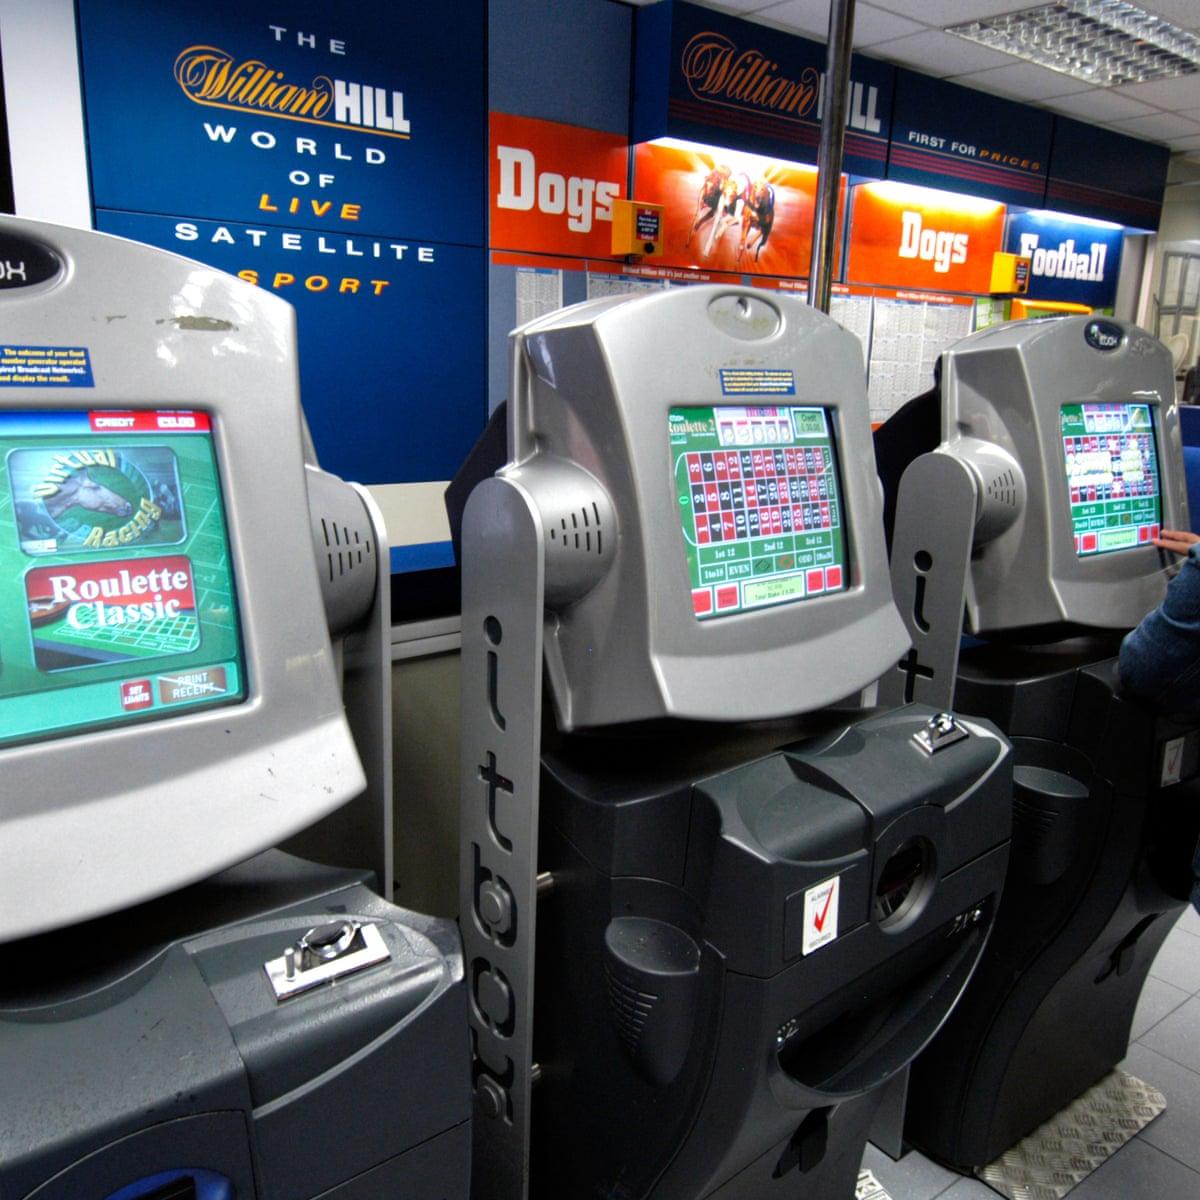 Ladbrokes betting machines tymix texture pack 1-3 2-4 betting system